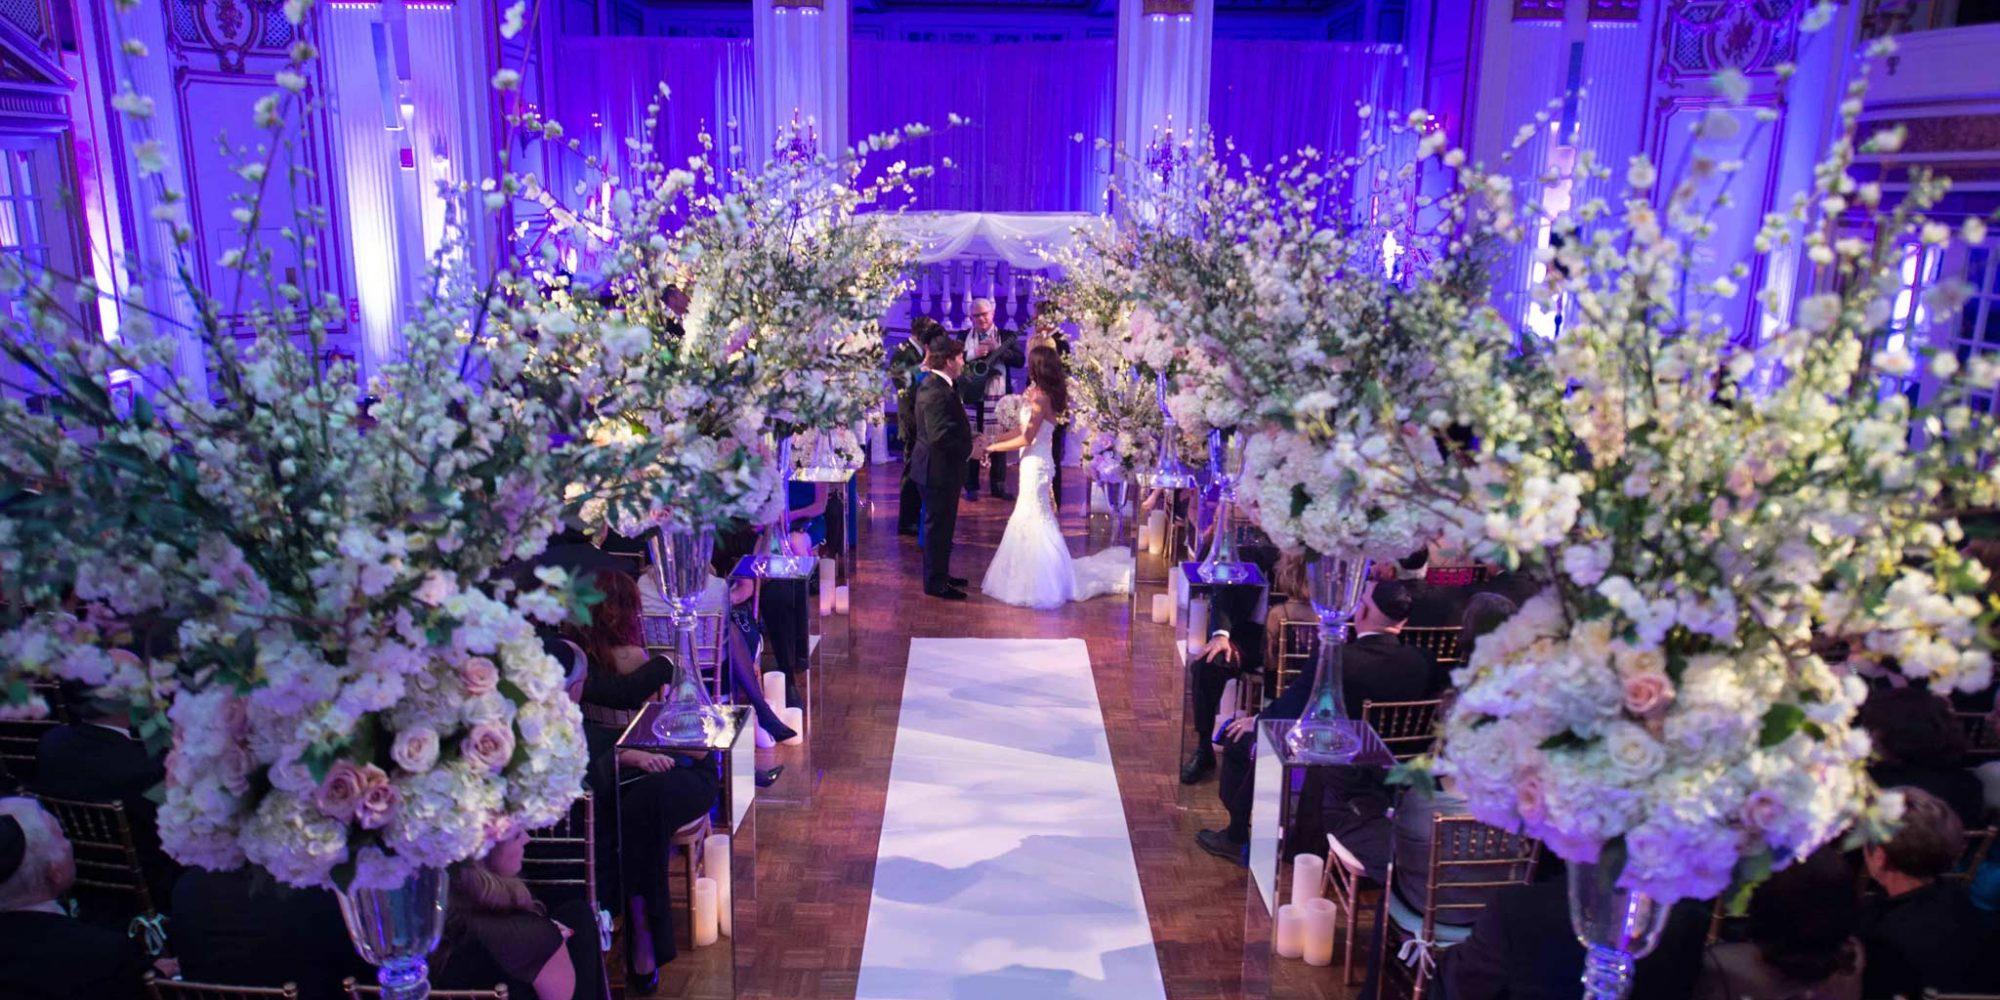 flou(-e)r specialty floral events – floral design for